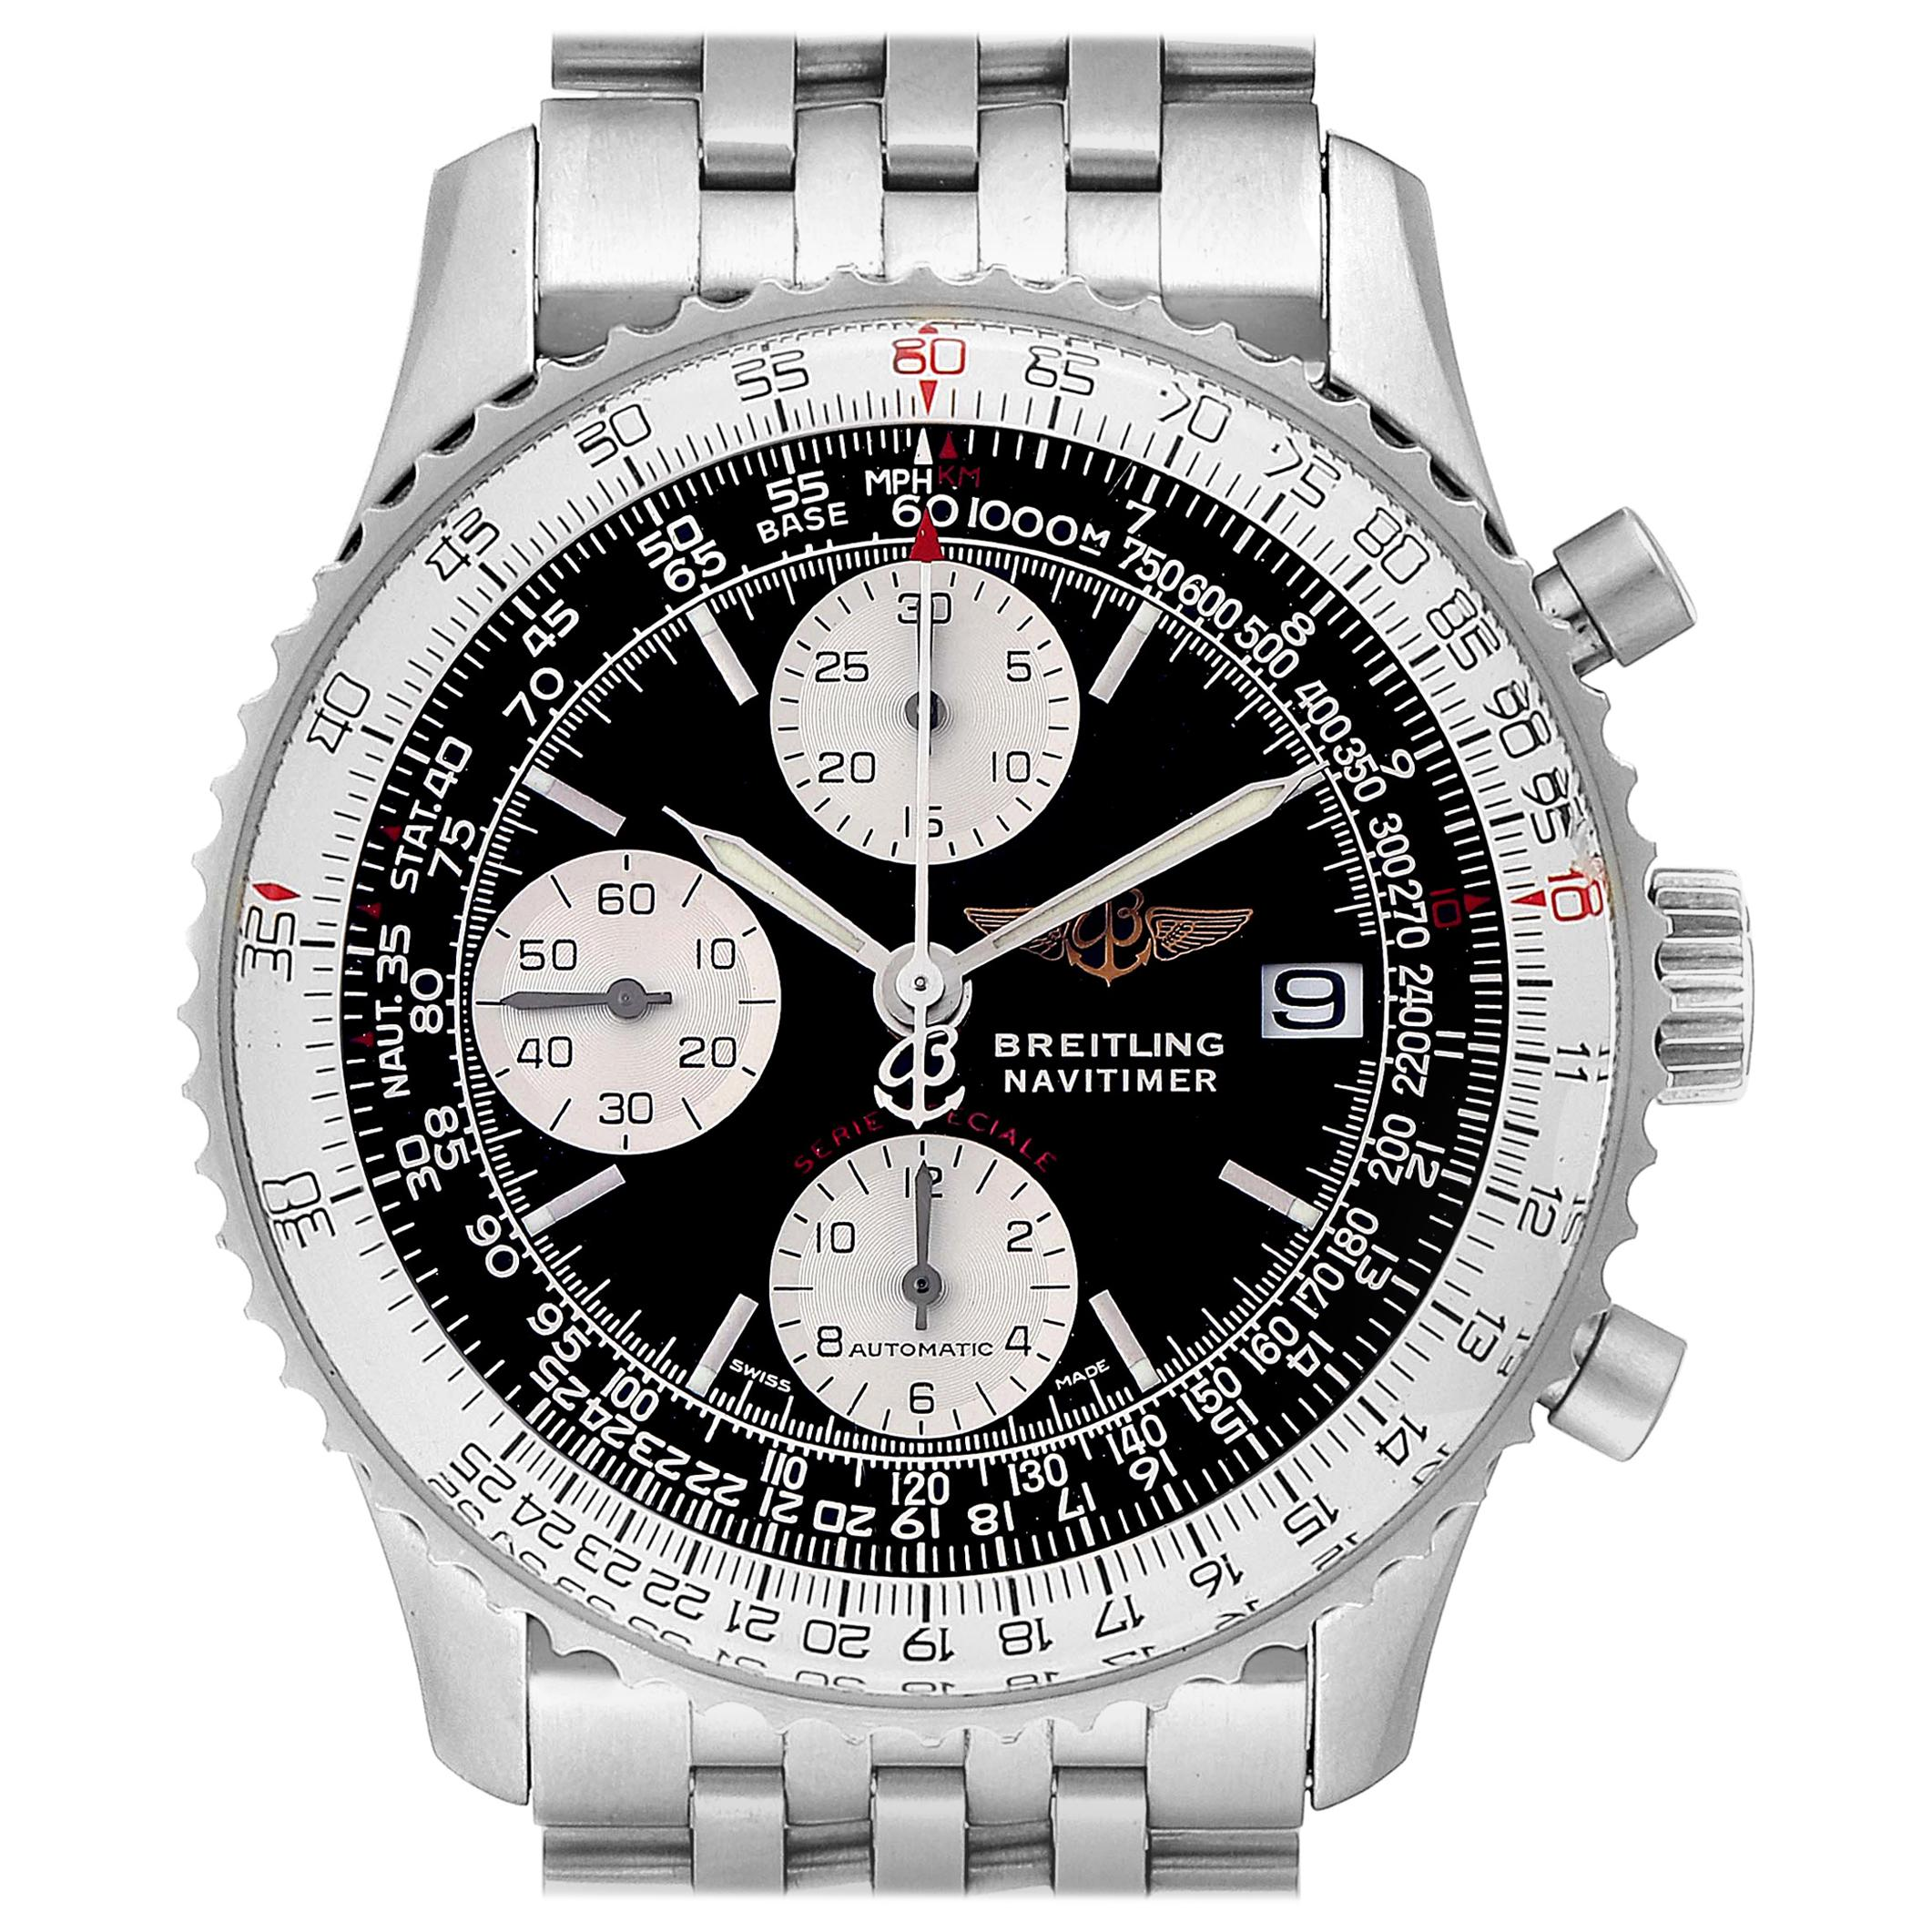 Breitling Navitimer Fighter Chronograph Steel Men's Watch A13330